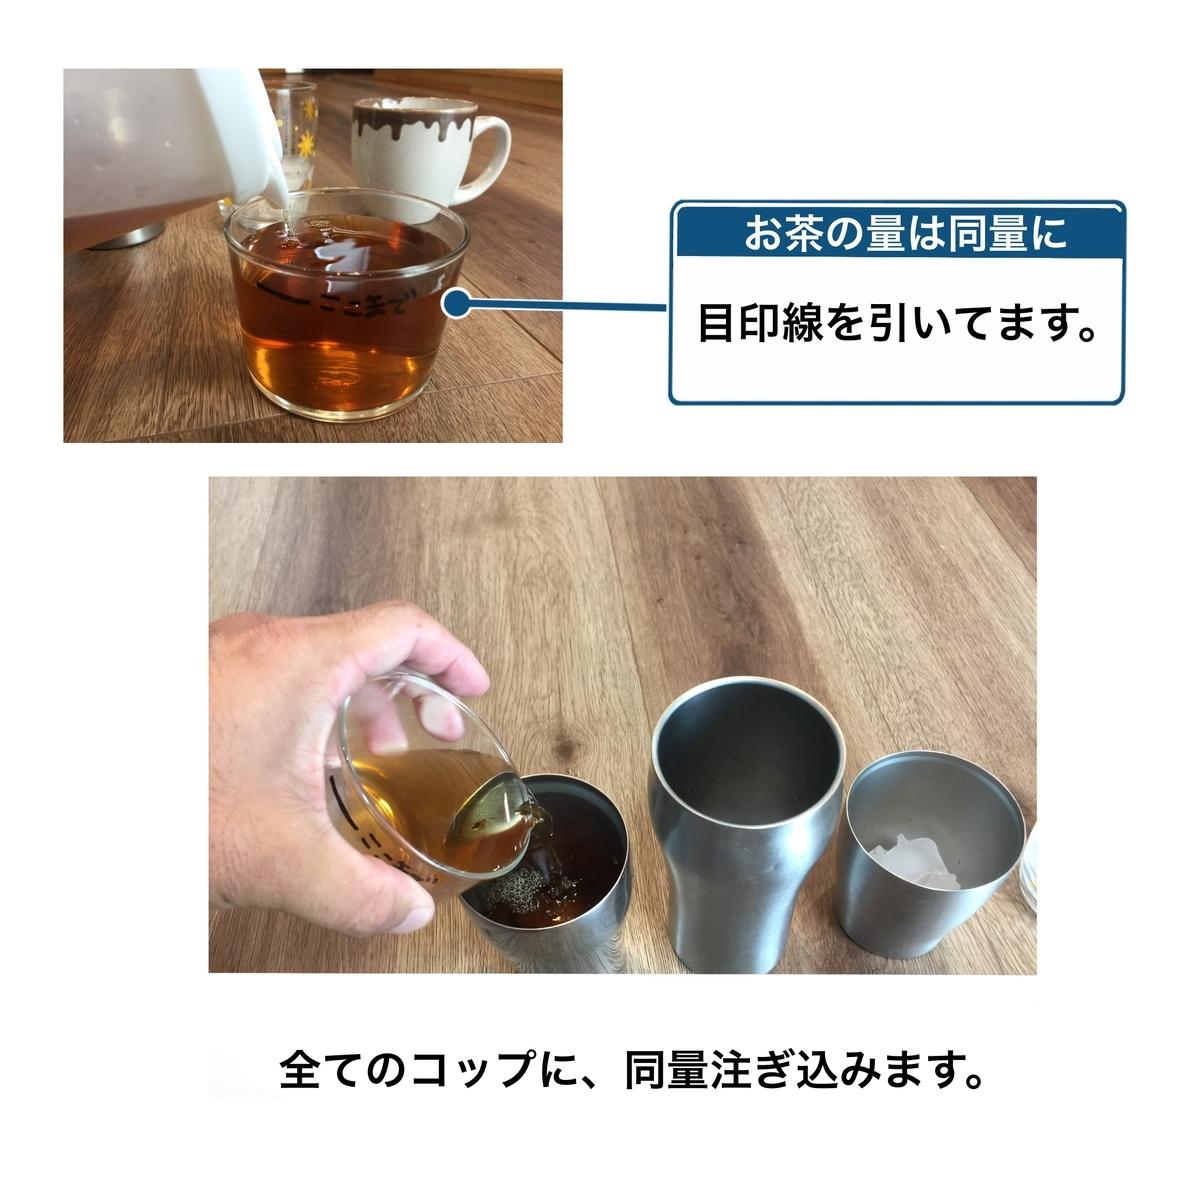 f:id:gomateishoku:20190824140835j:plain